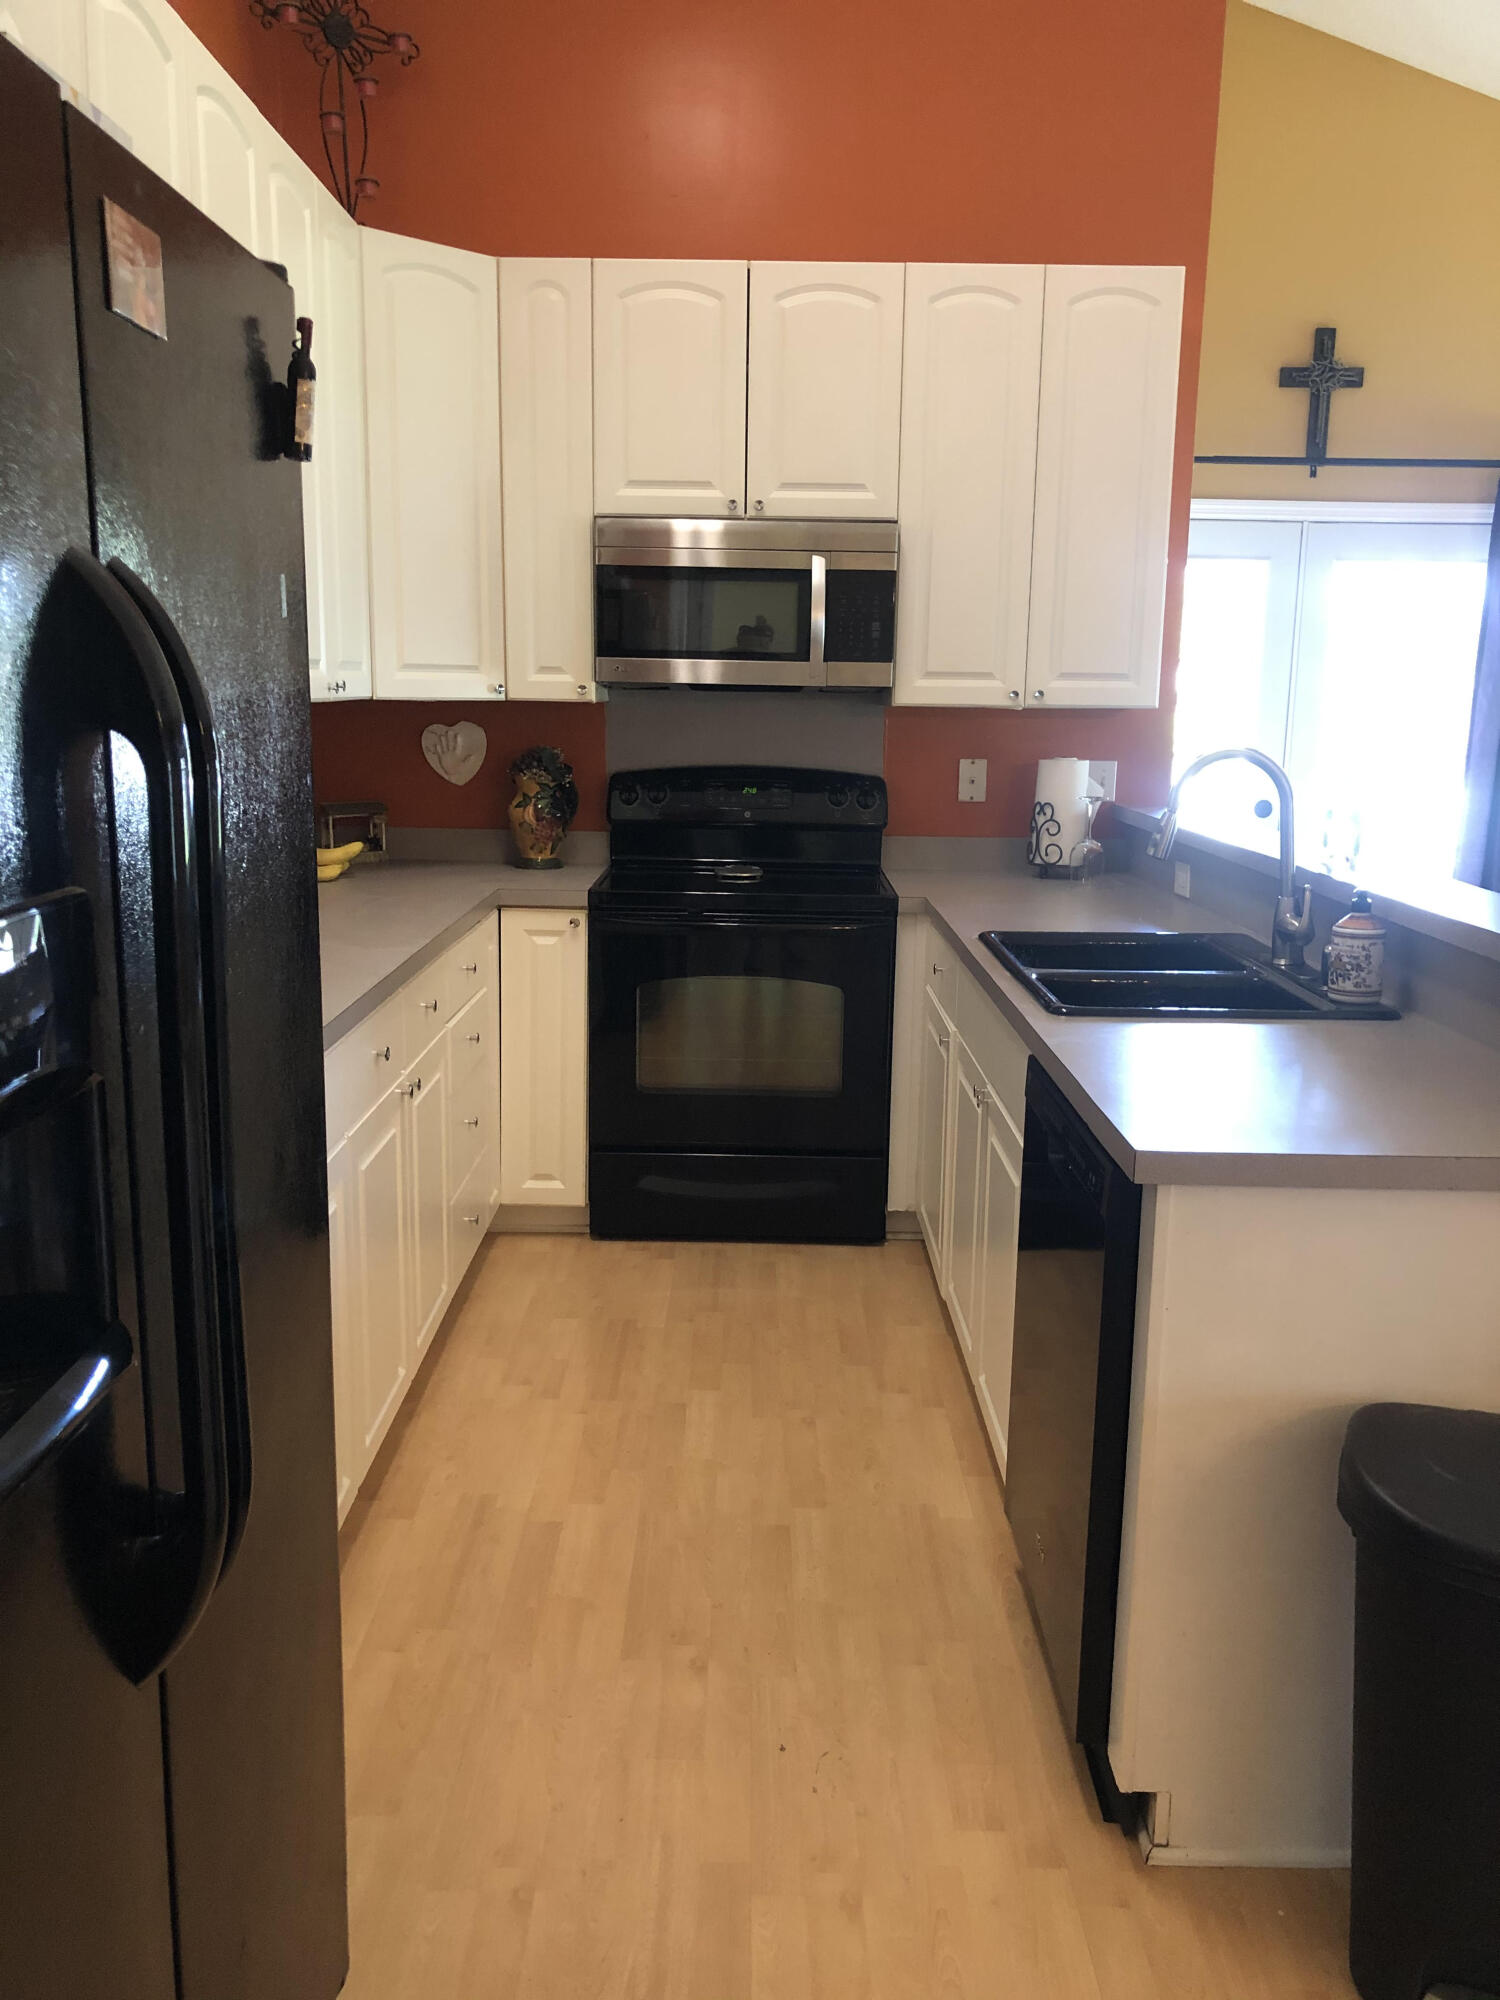 Sunburst Lakes Homes For Sale - 141 Jupiter, Summerville, SC - 3